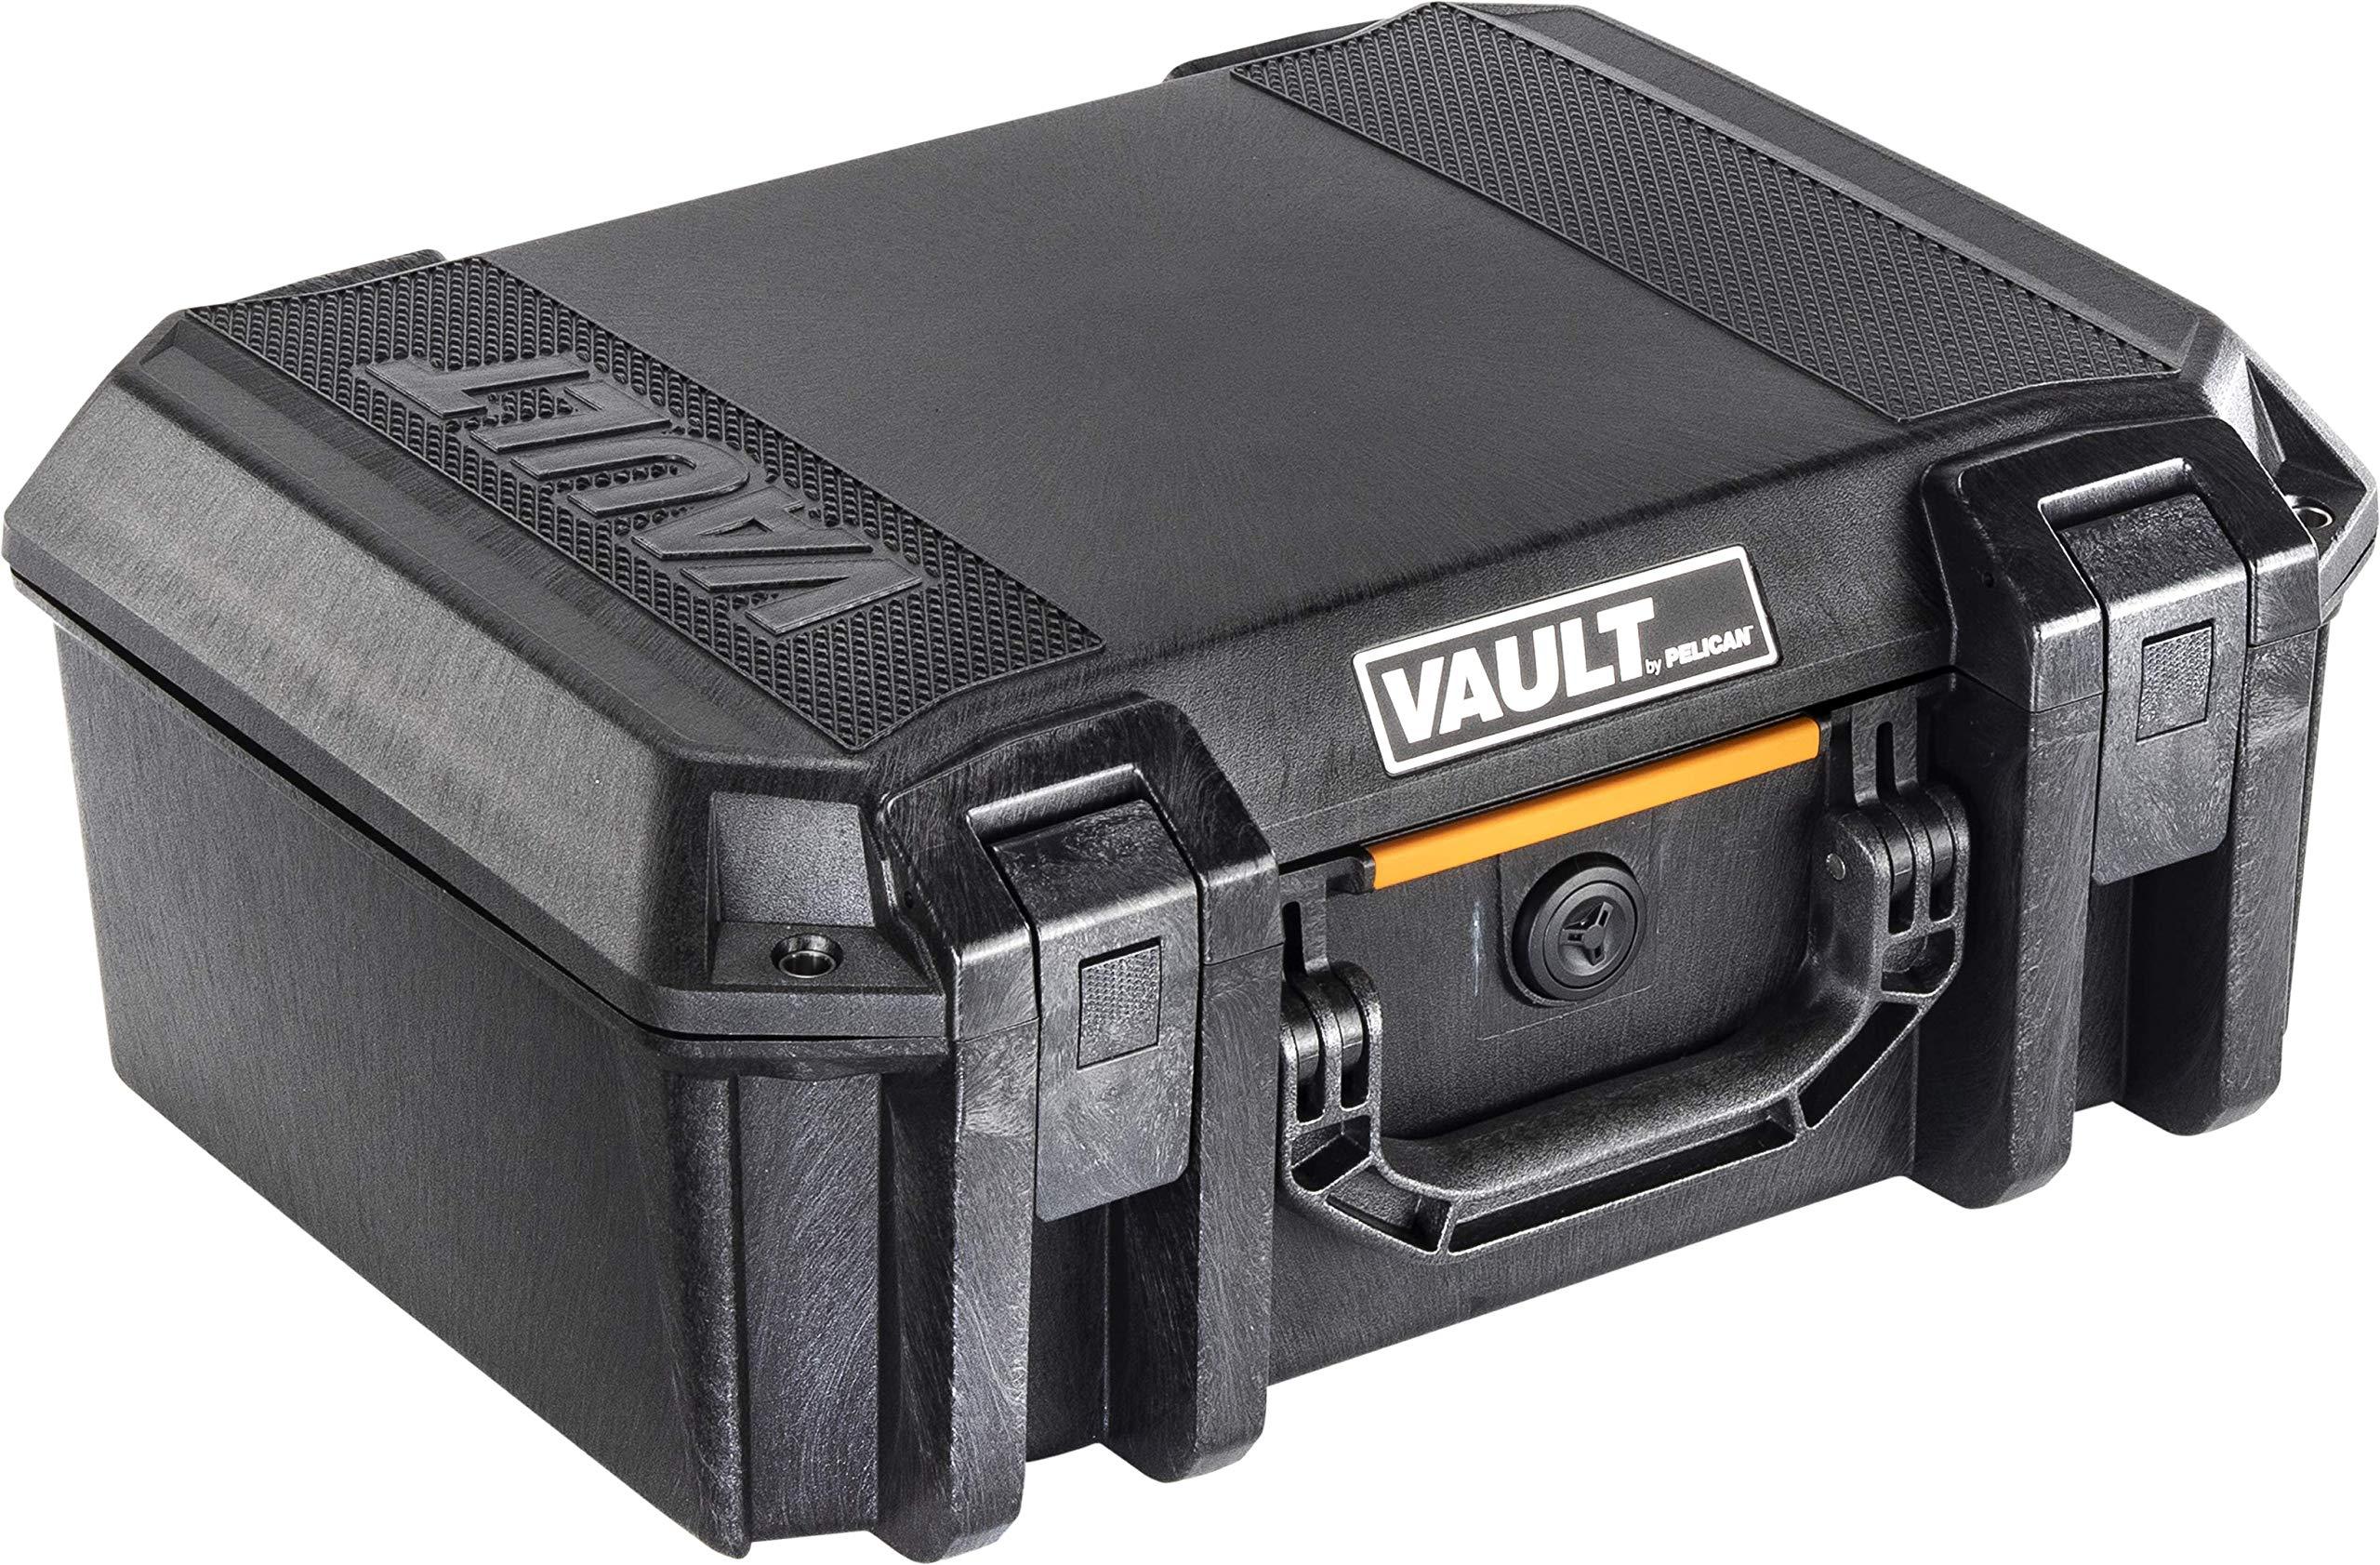 Vault V300 Pistol Case with Foam - by Pelican (Black) by Pelican